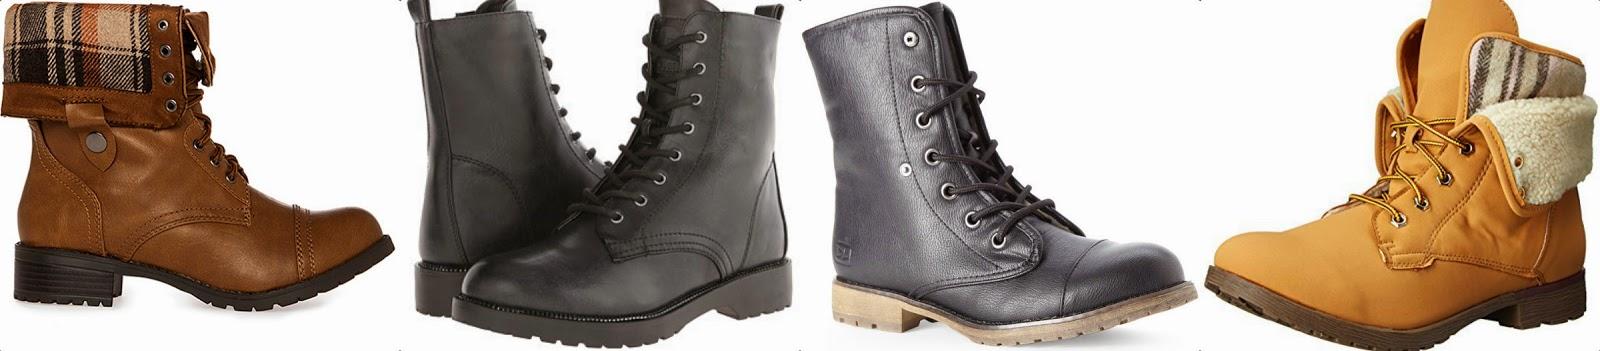 brown black and cognac combat boots